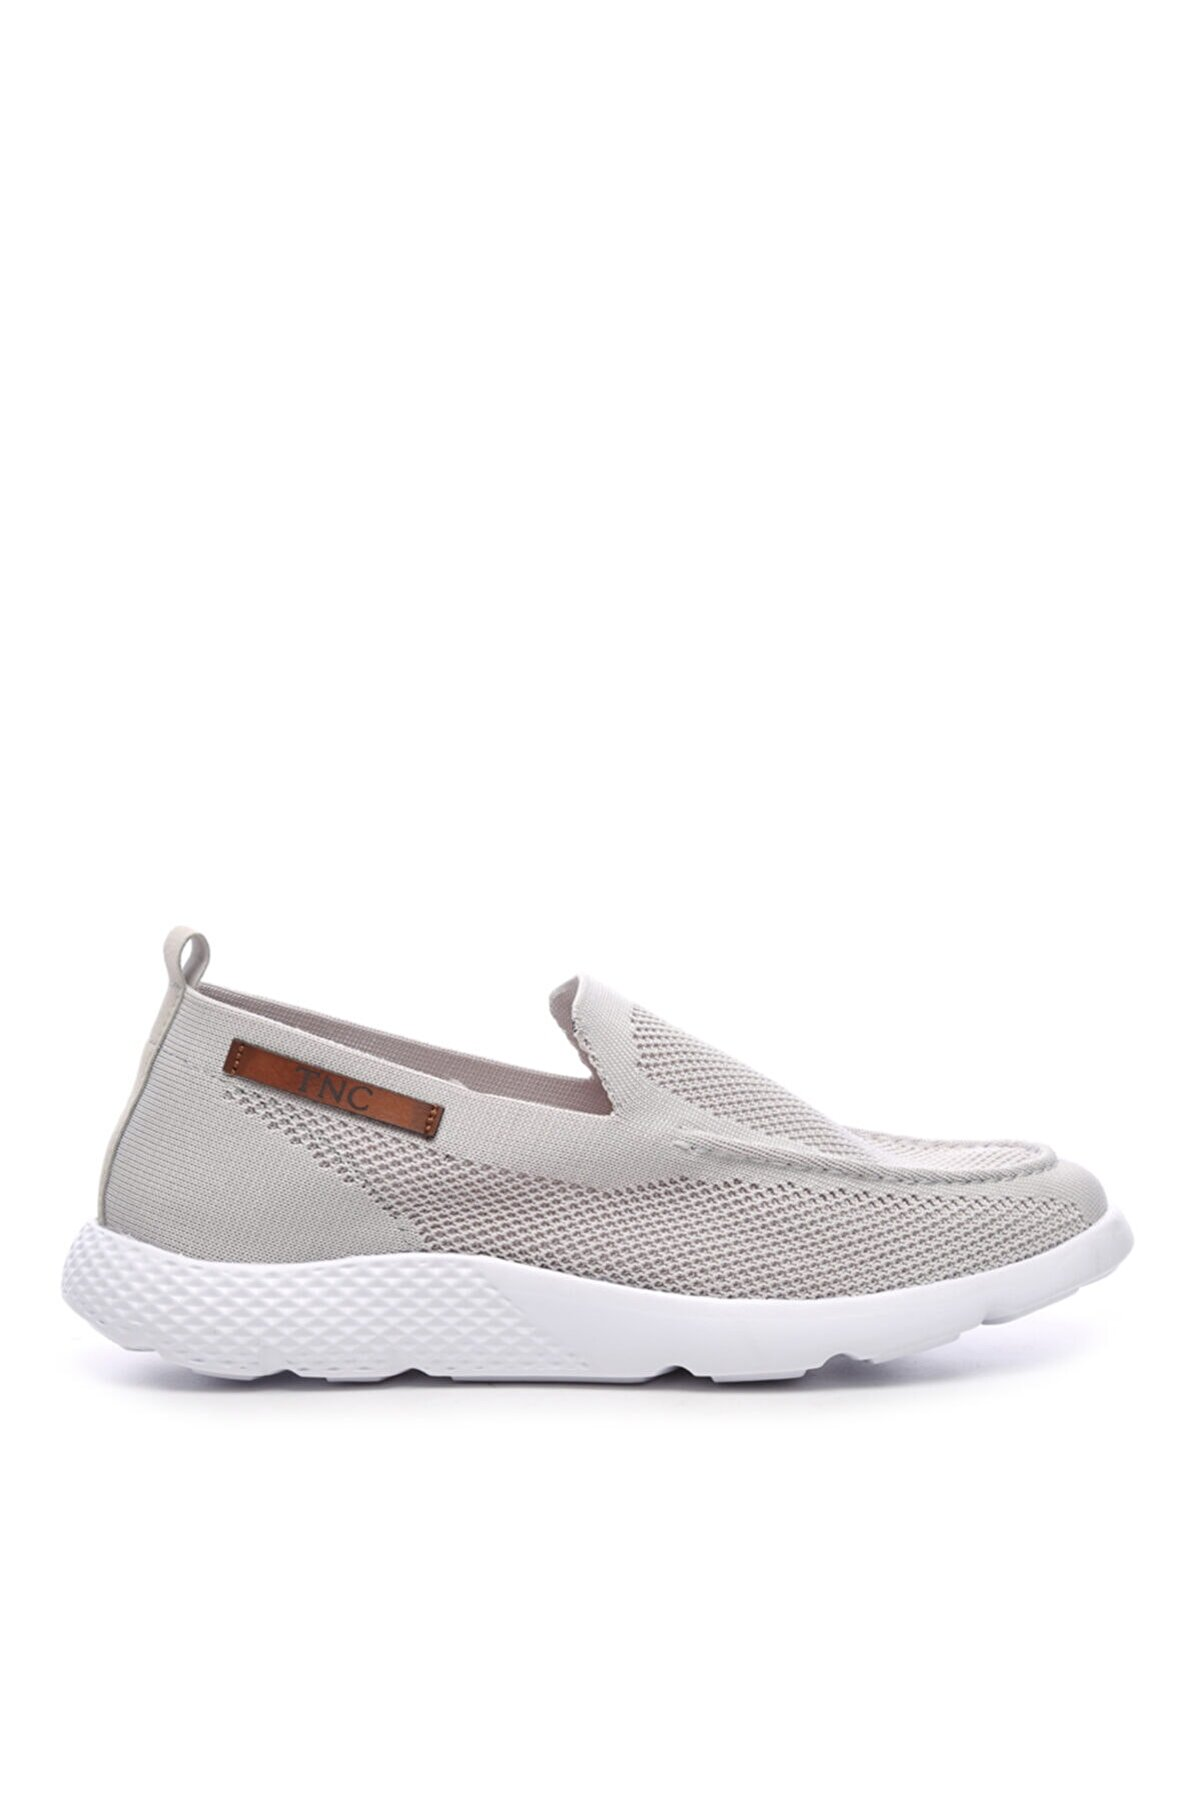 Kemal Tanca Erkek Tekstıl Mokasen & Loafer Ayakkabı 772 T80 ERK AYK Y20